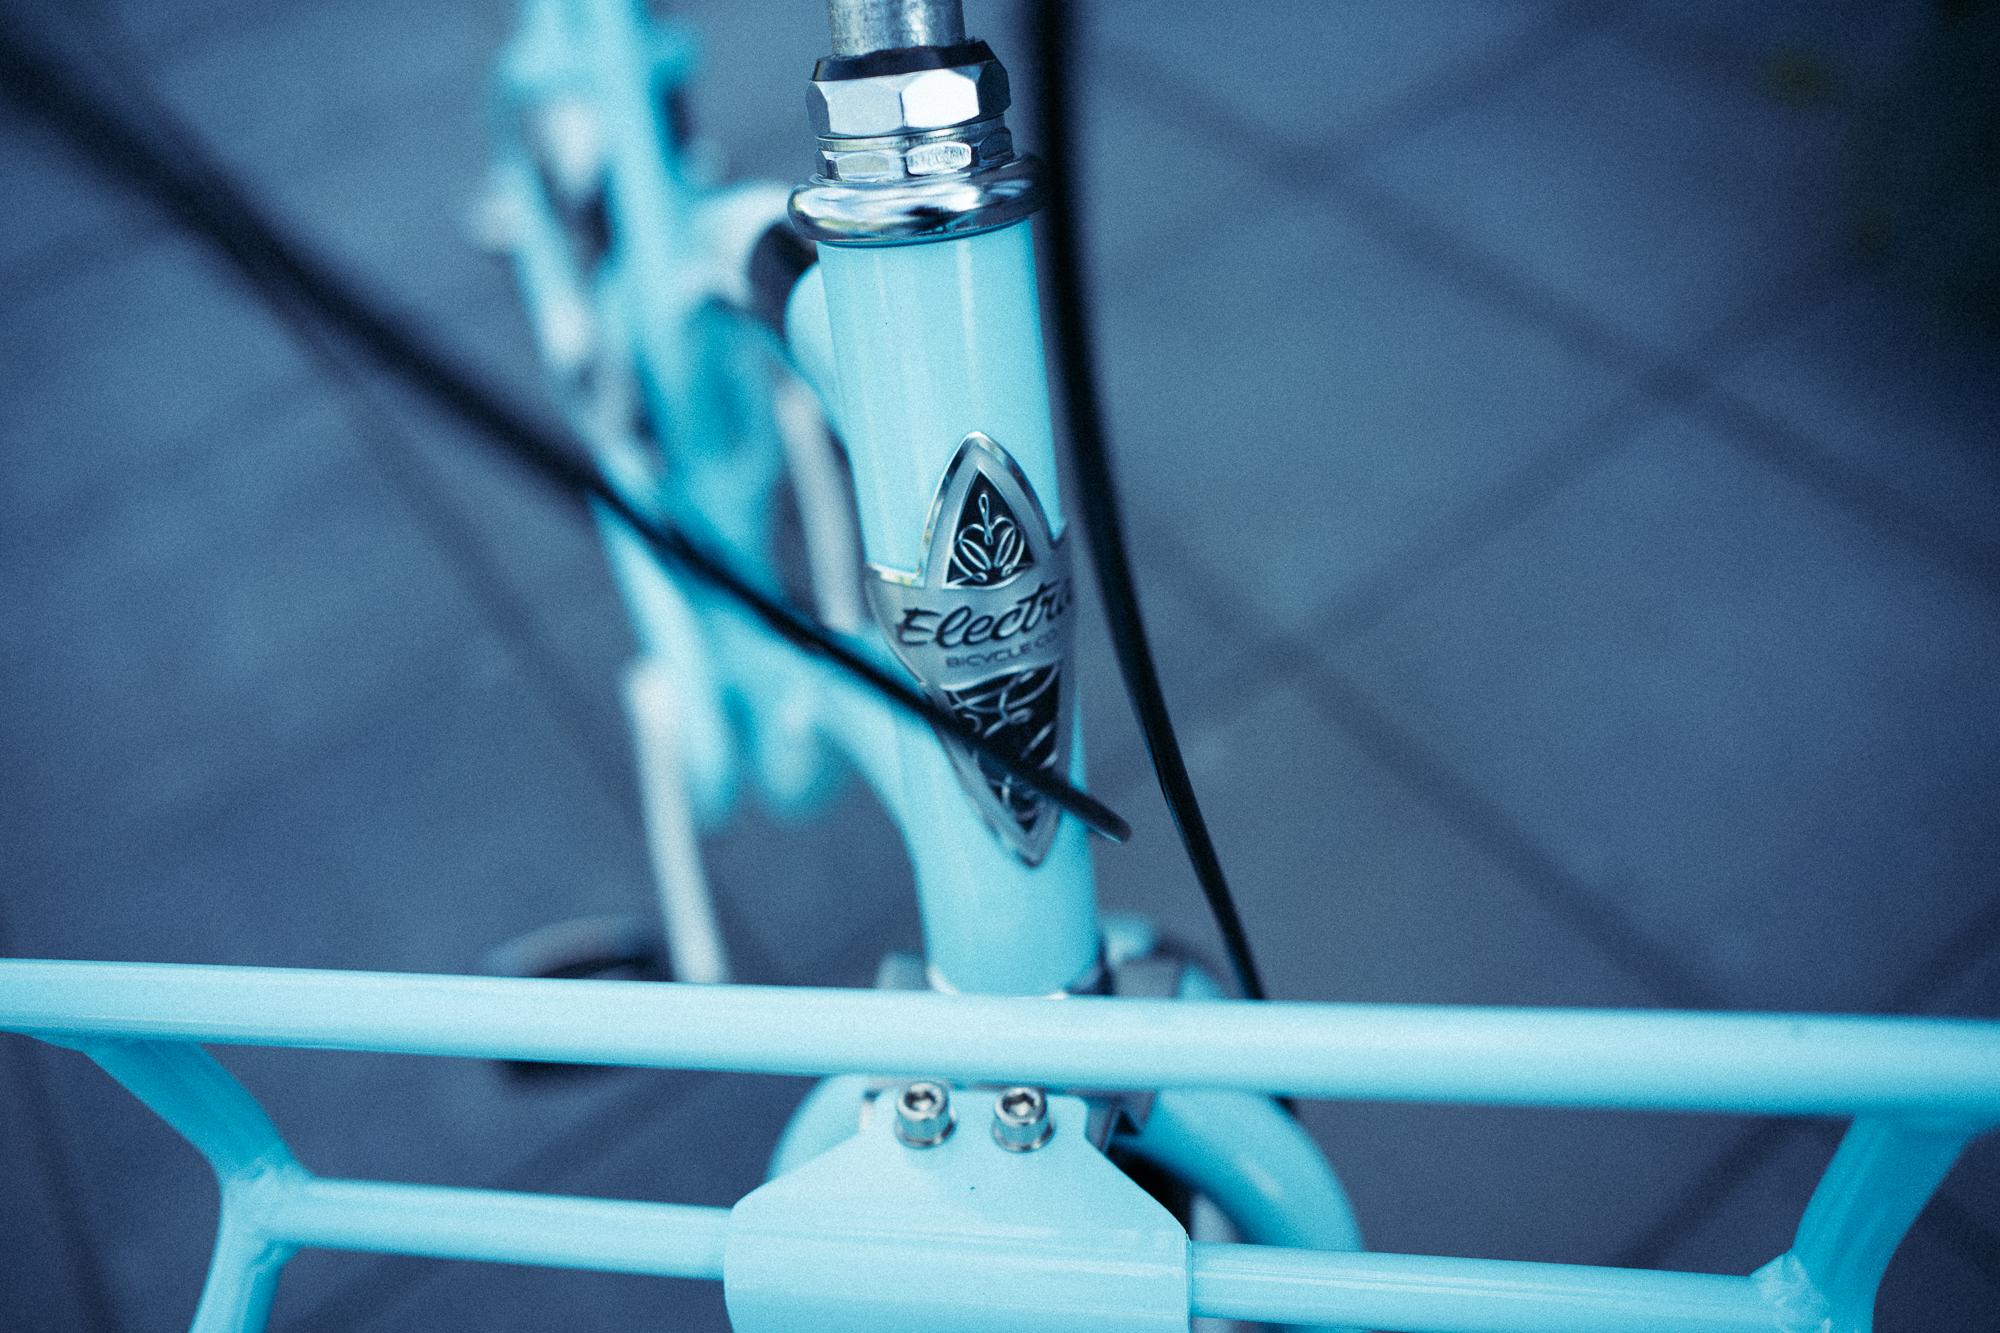 Electra Bike Chalet Zeeland Holland Daydream3i